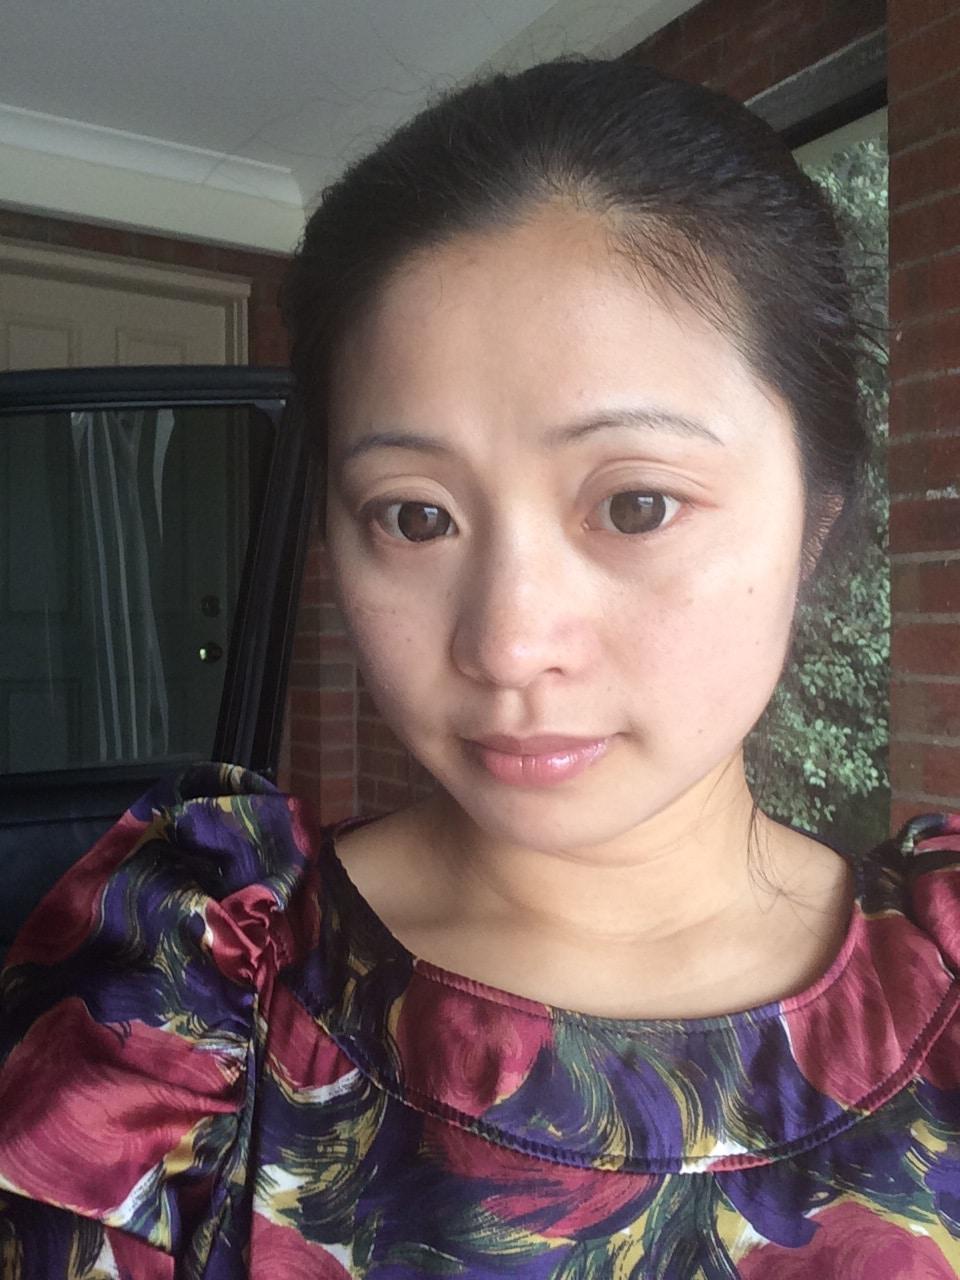 Lin from Warrnambool